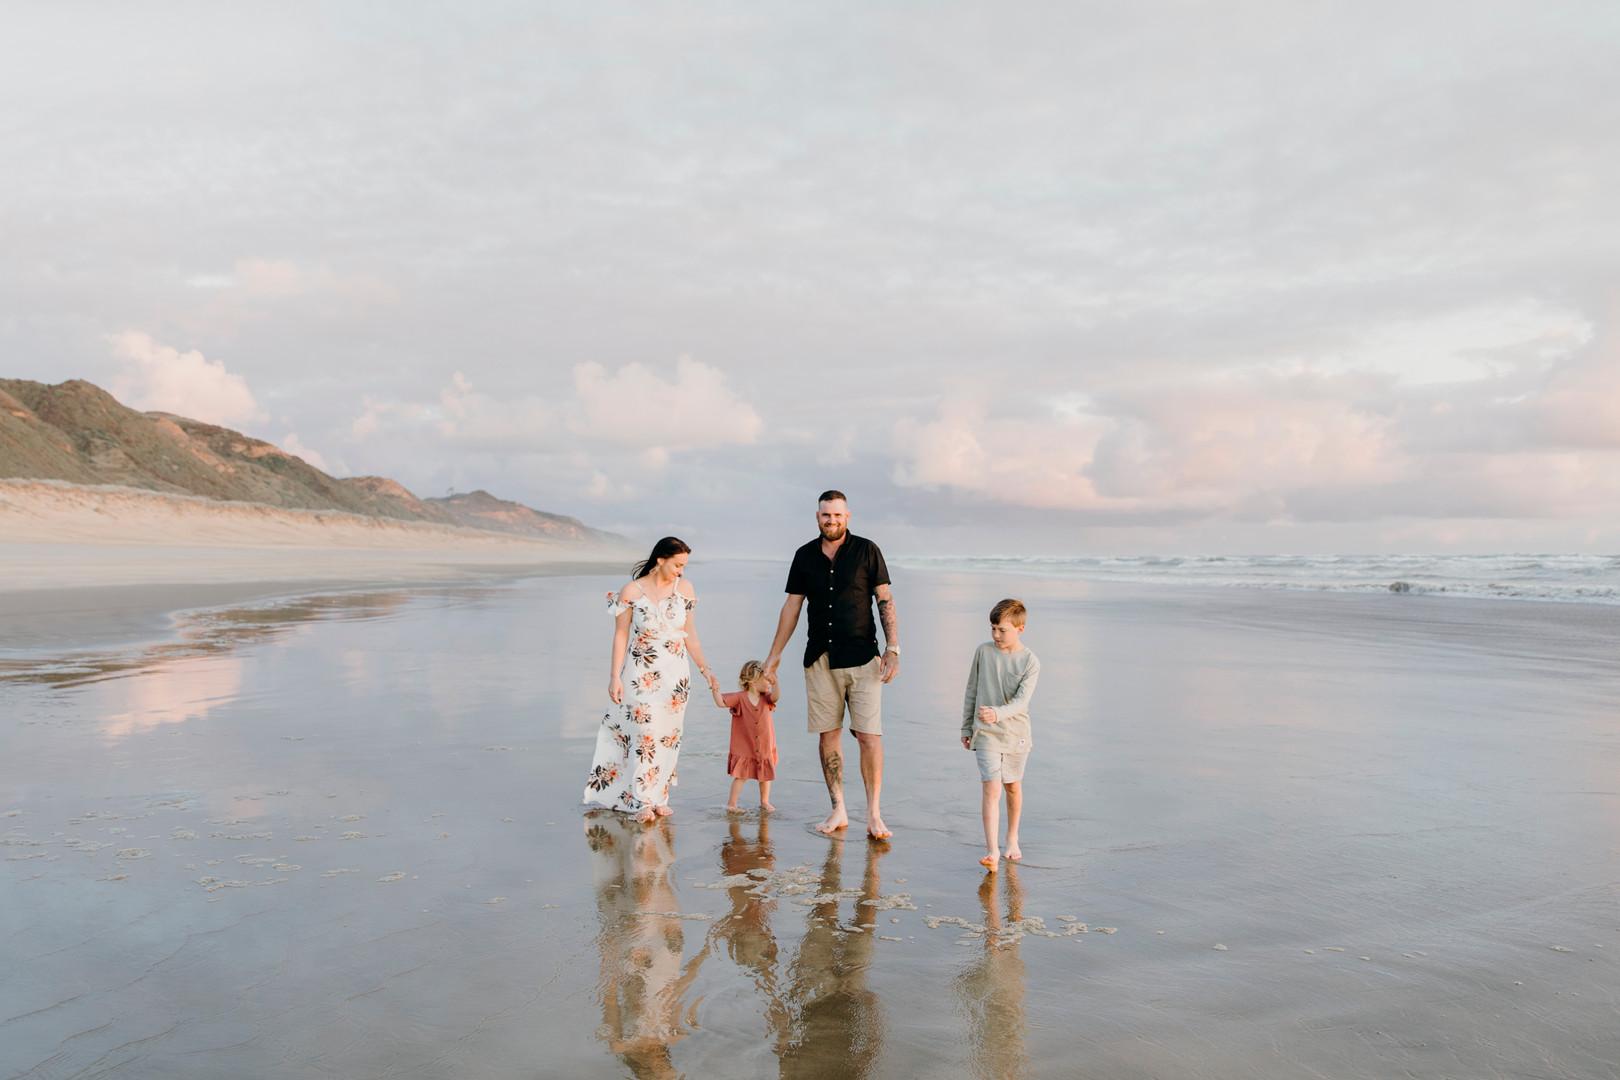 Hamilton Family Portrait Photographer | Haley Adele Photography